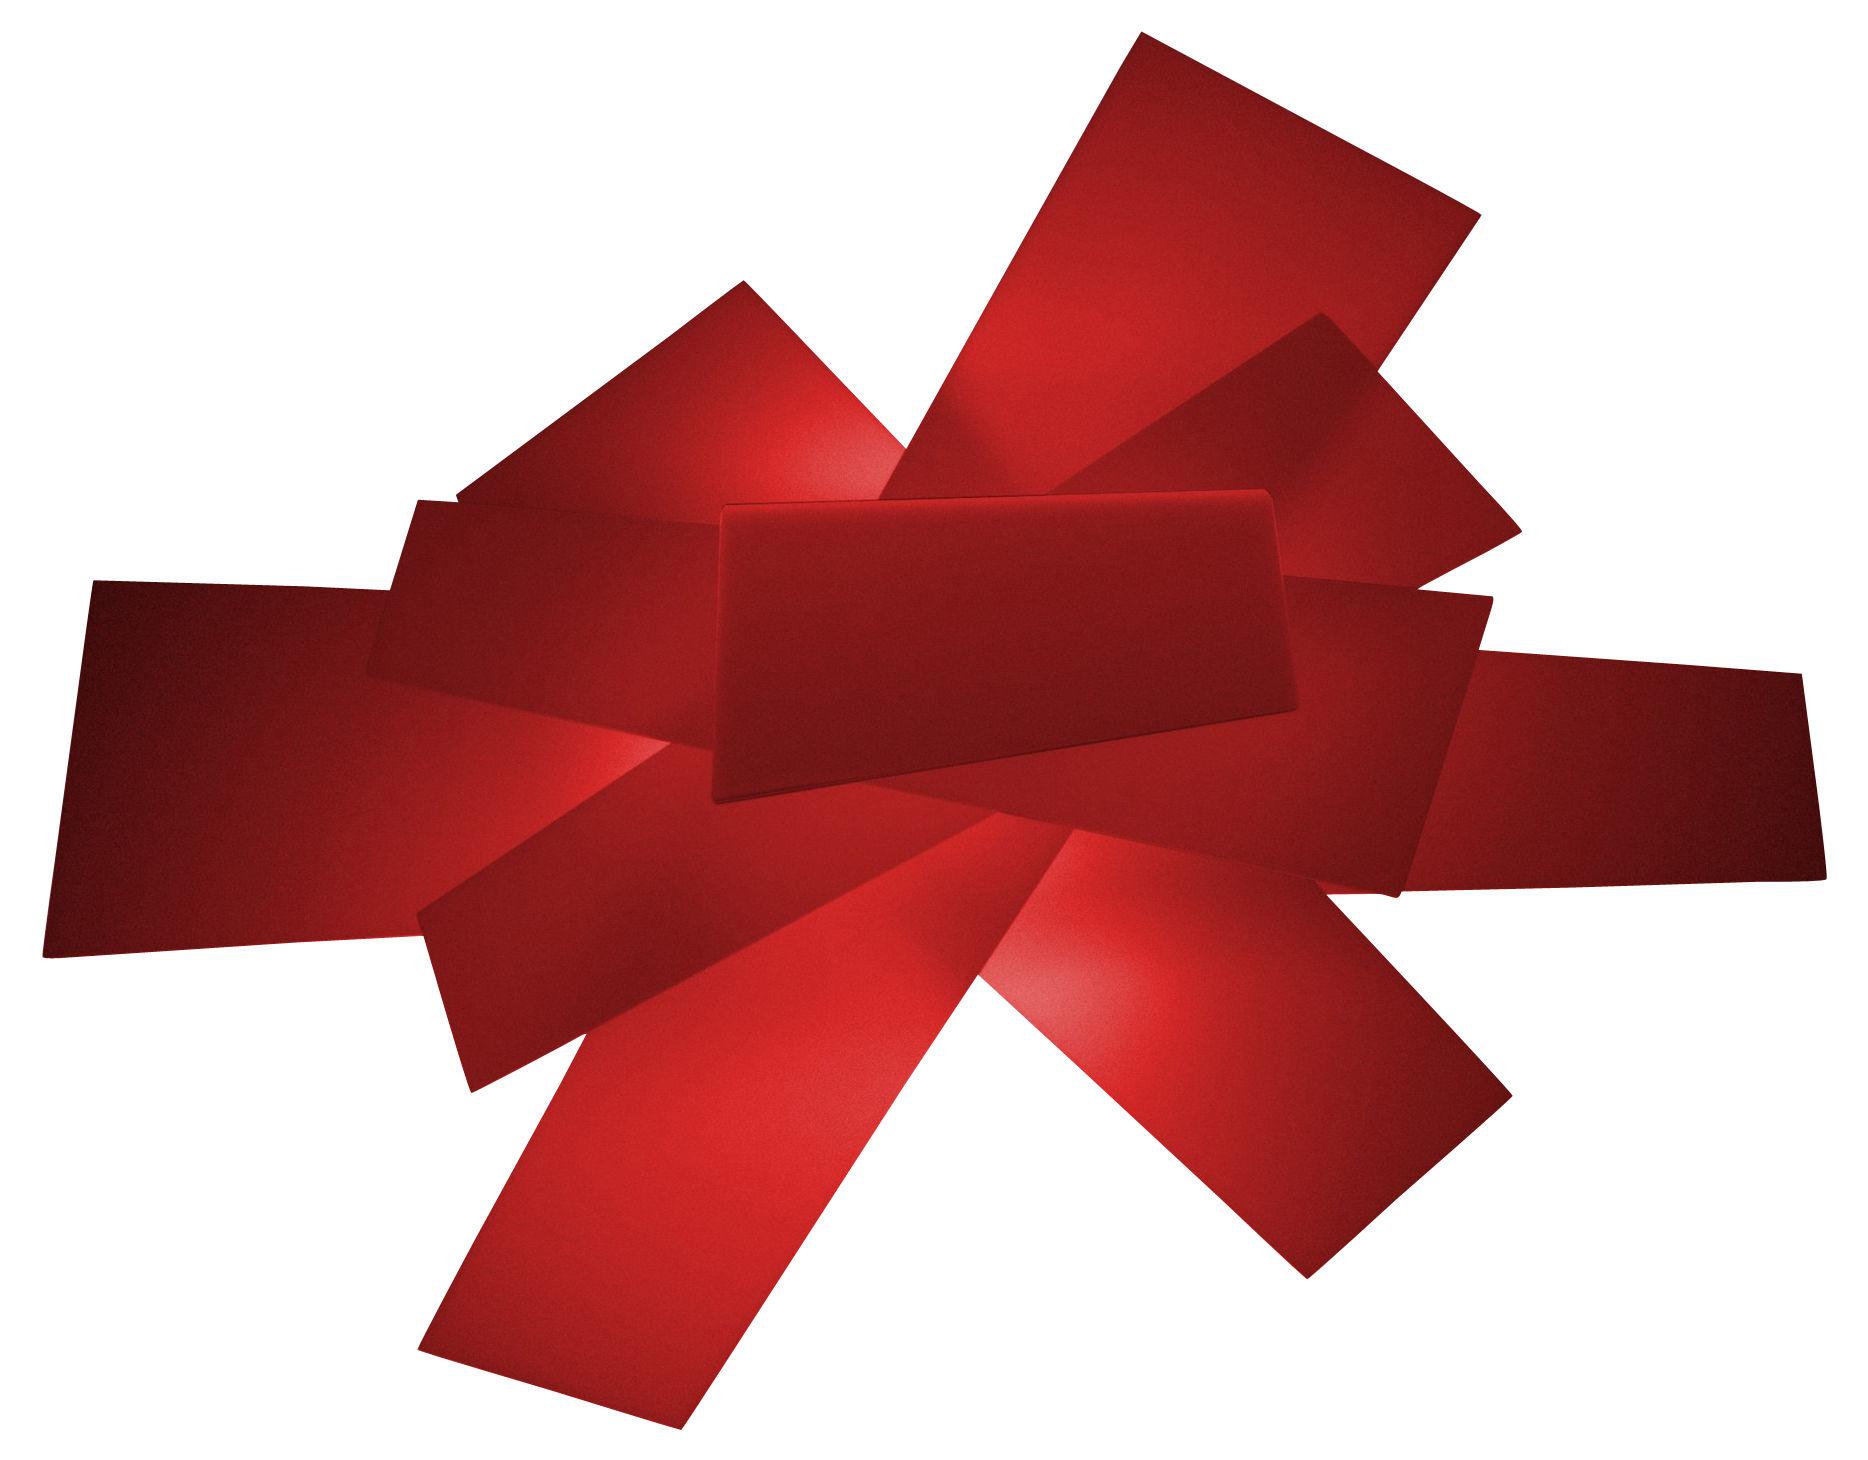 Luminaire - Appliques - Applique Big Bang / Plafonnier - Foscarini - Rouge & blanc - Méthacrylate